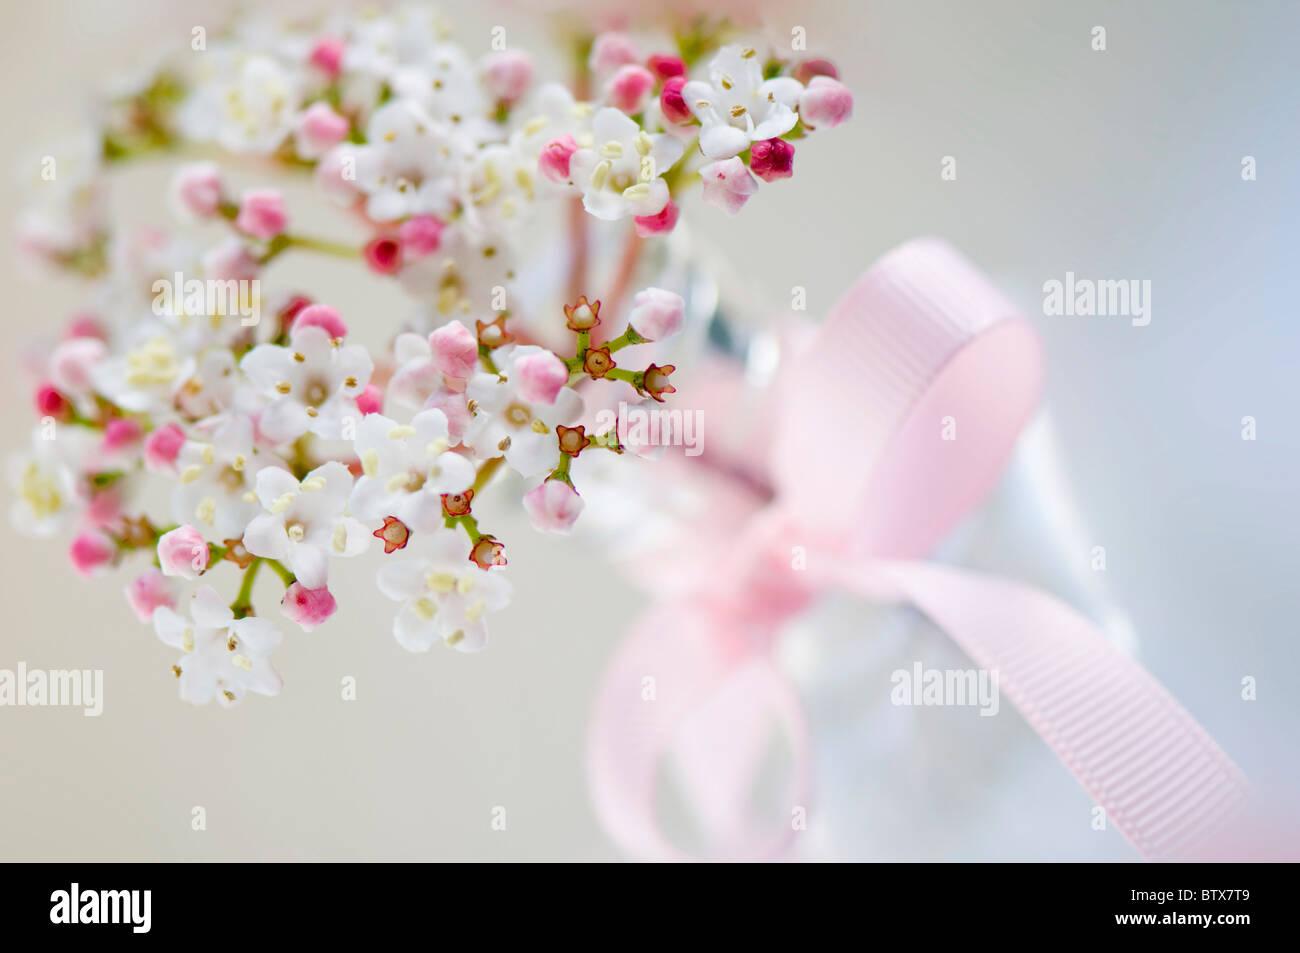 Viburnum flowers in vase pink bow - Stock Image